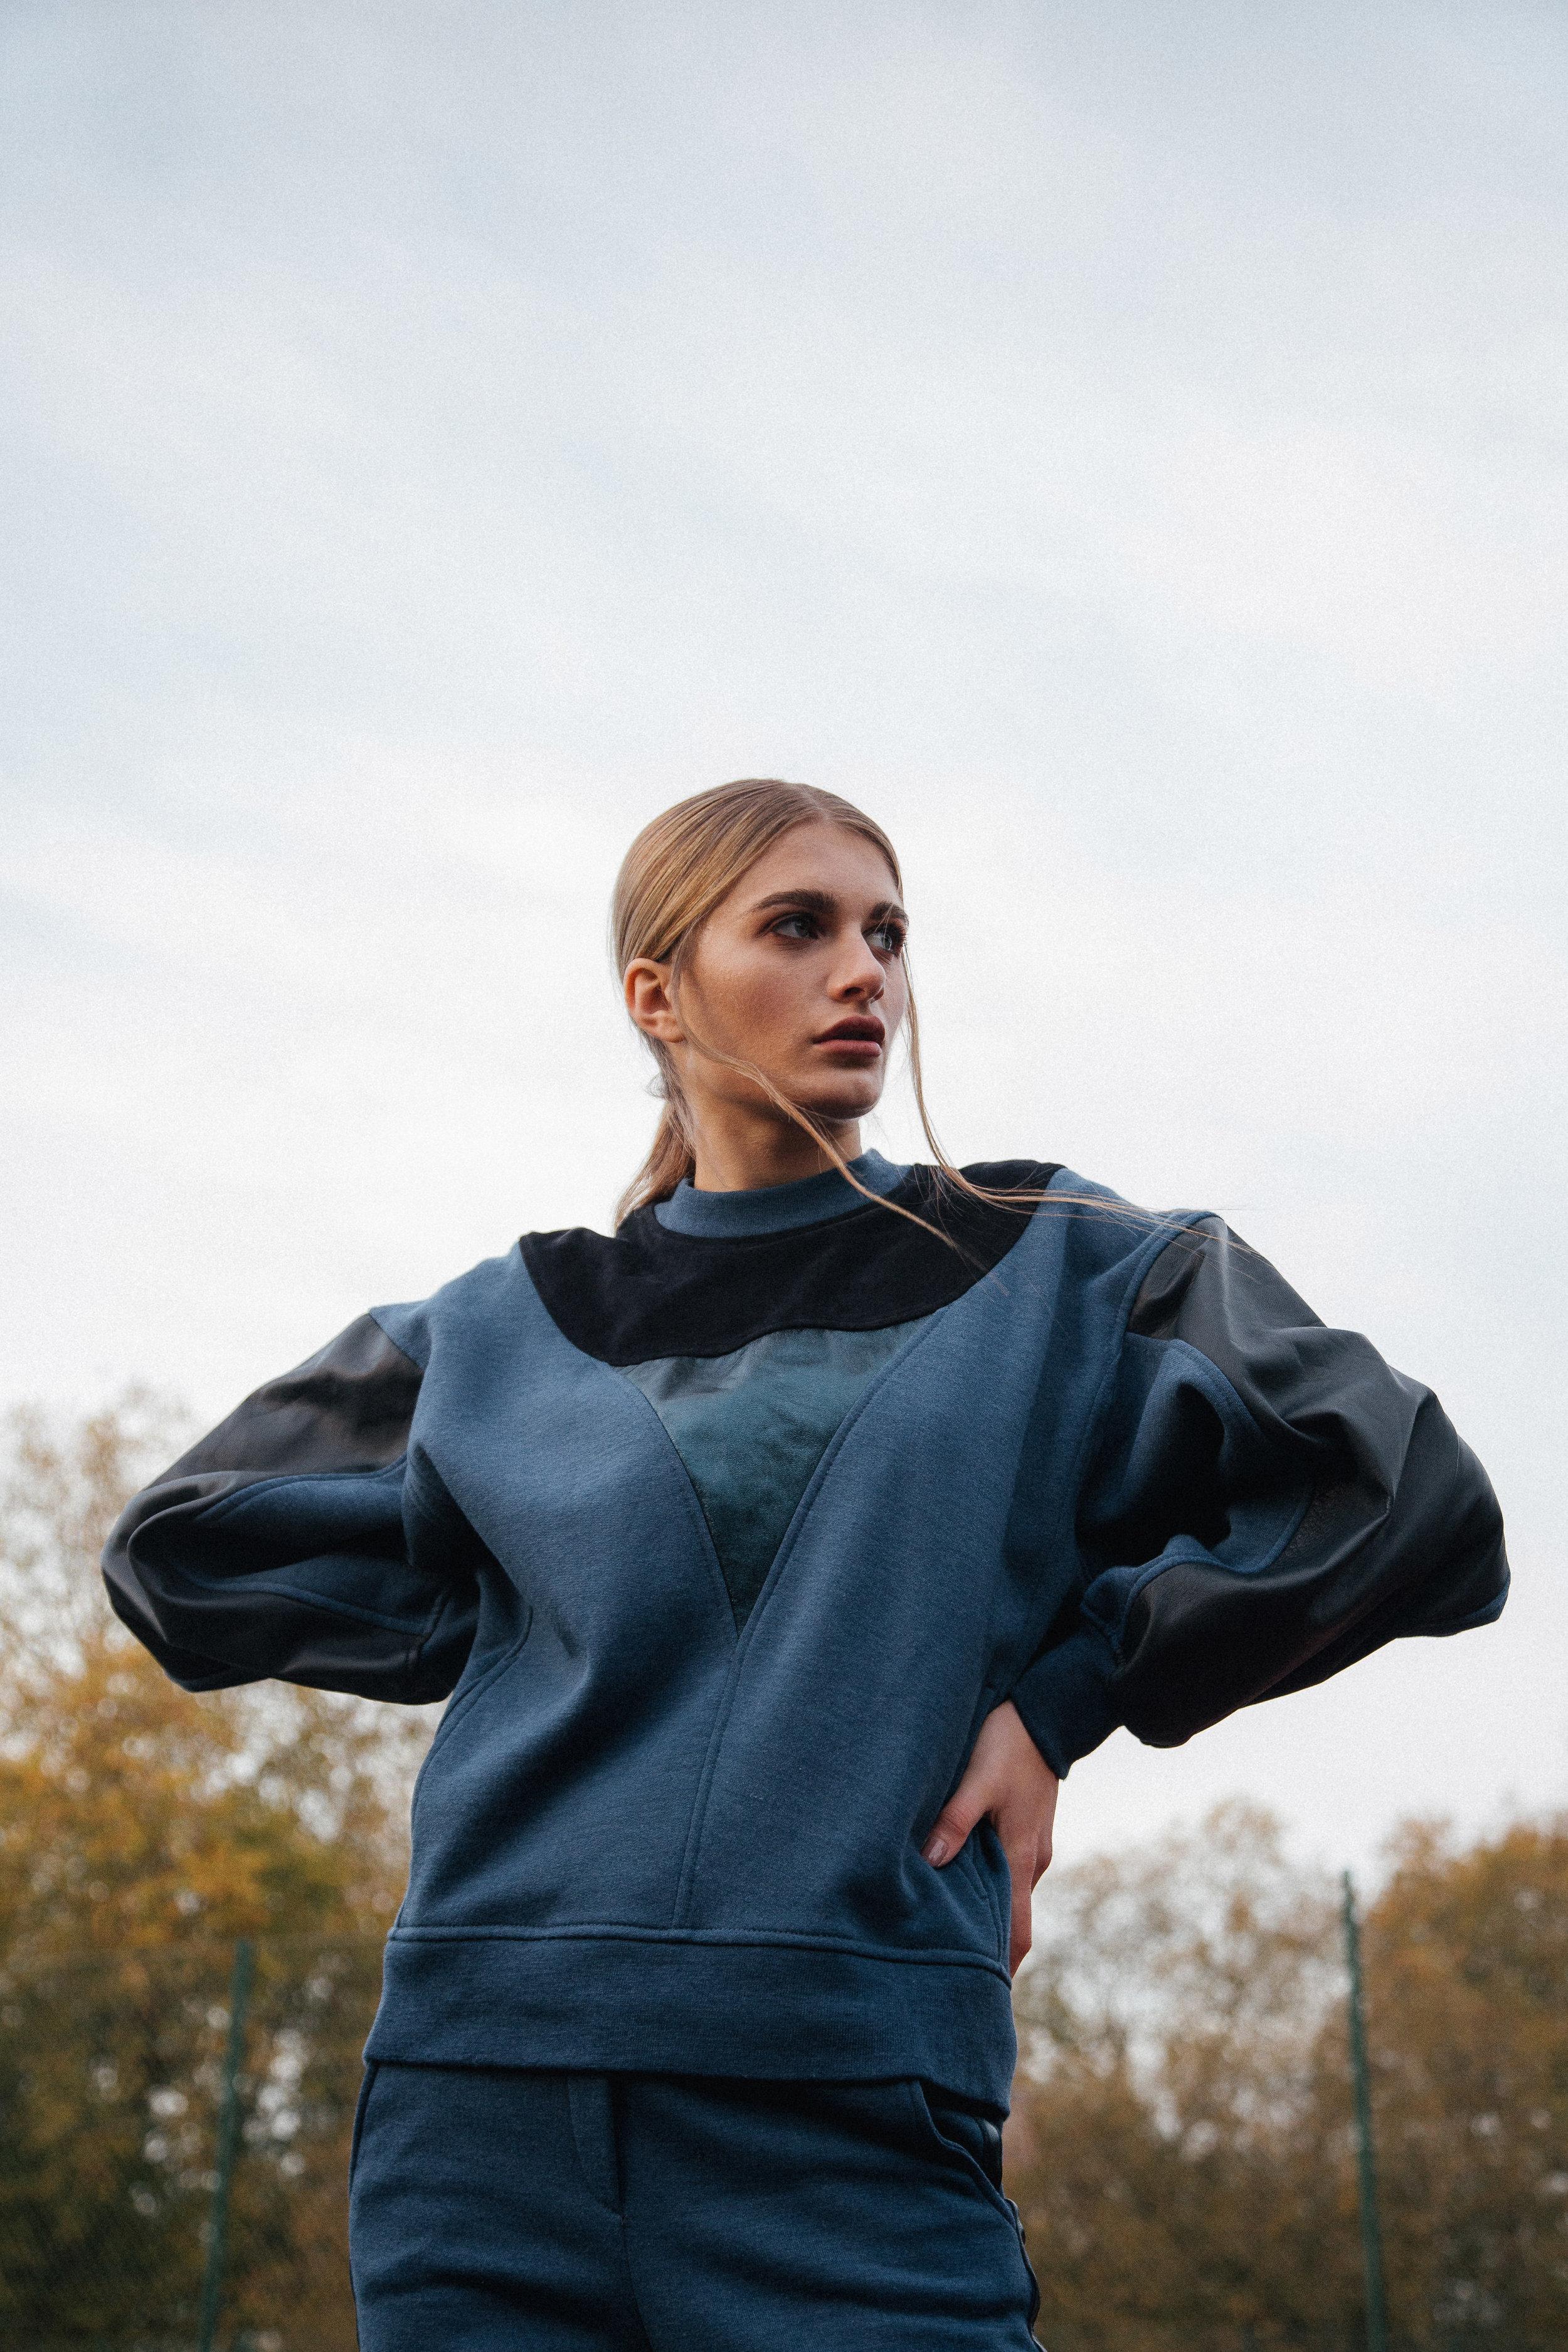 For - Pritch London  Model - Barbara Majder @ The Squad  Stylist - Yasmine Sabri  H/MUA - Tash Sultana  //